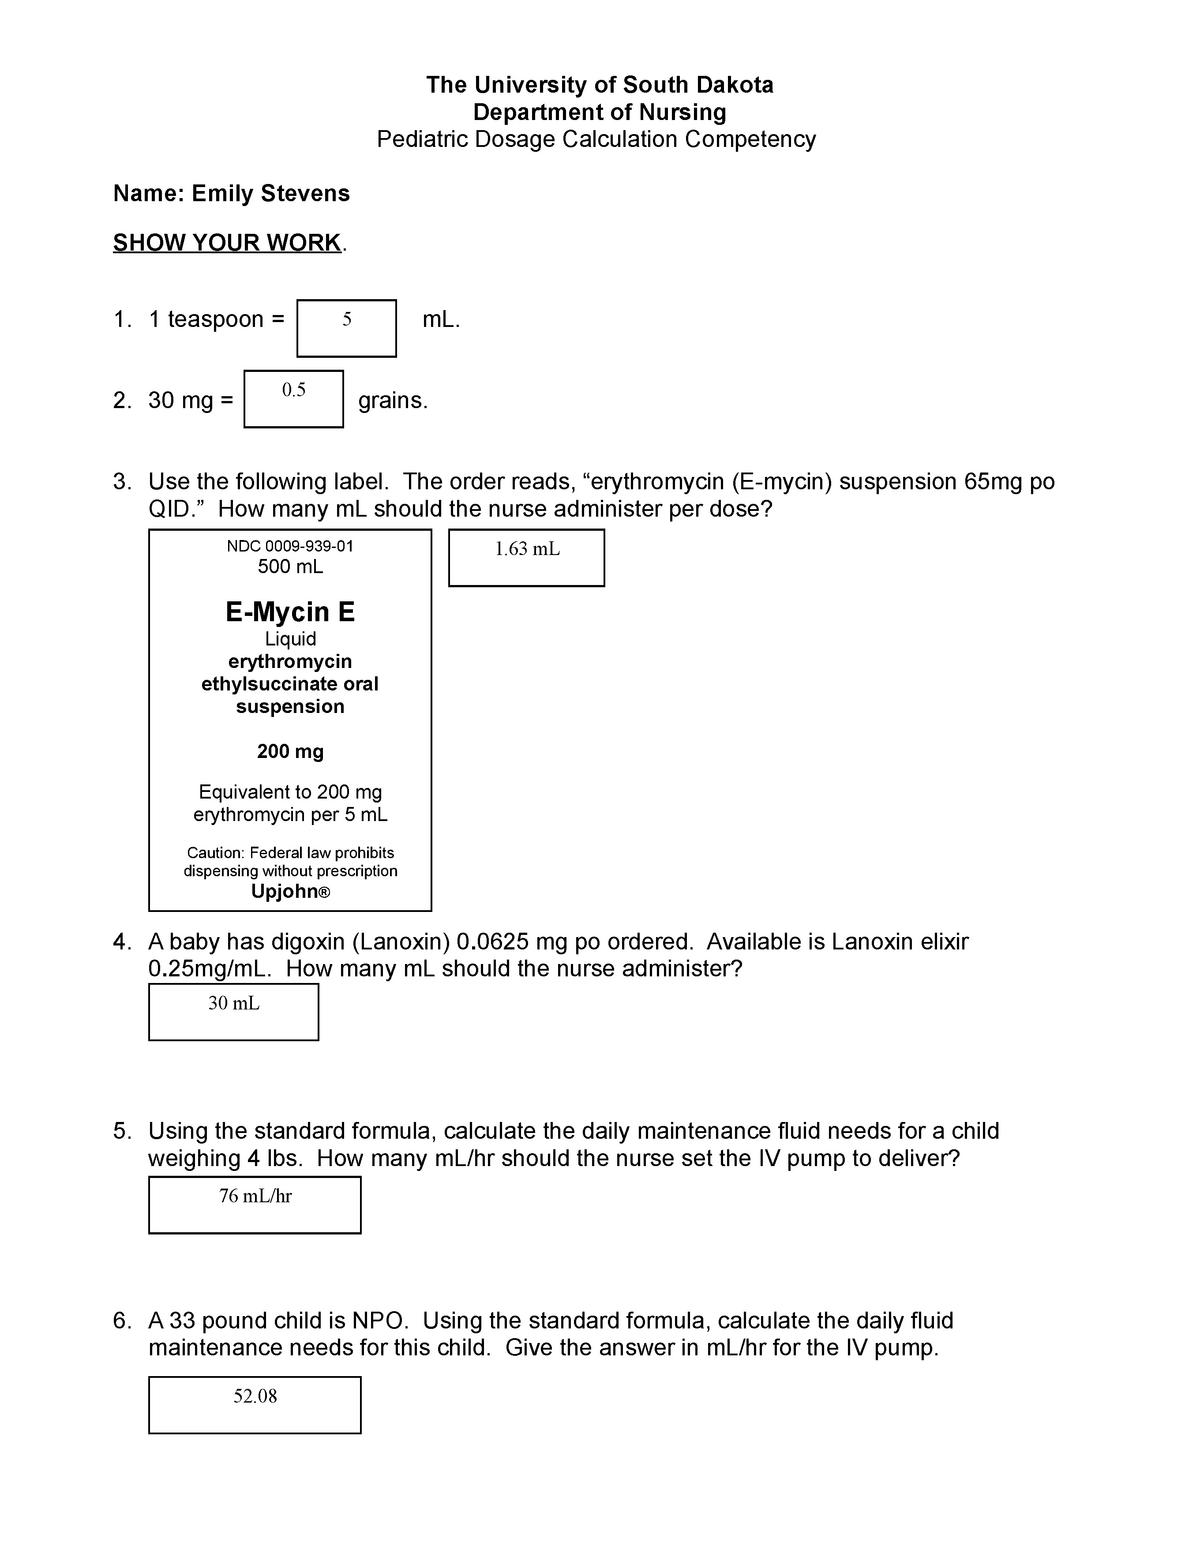 N330 Peds Dosage Calc Lab Prep Studocu